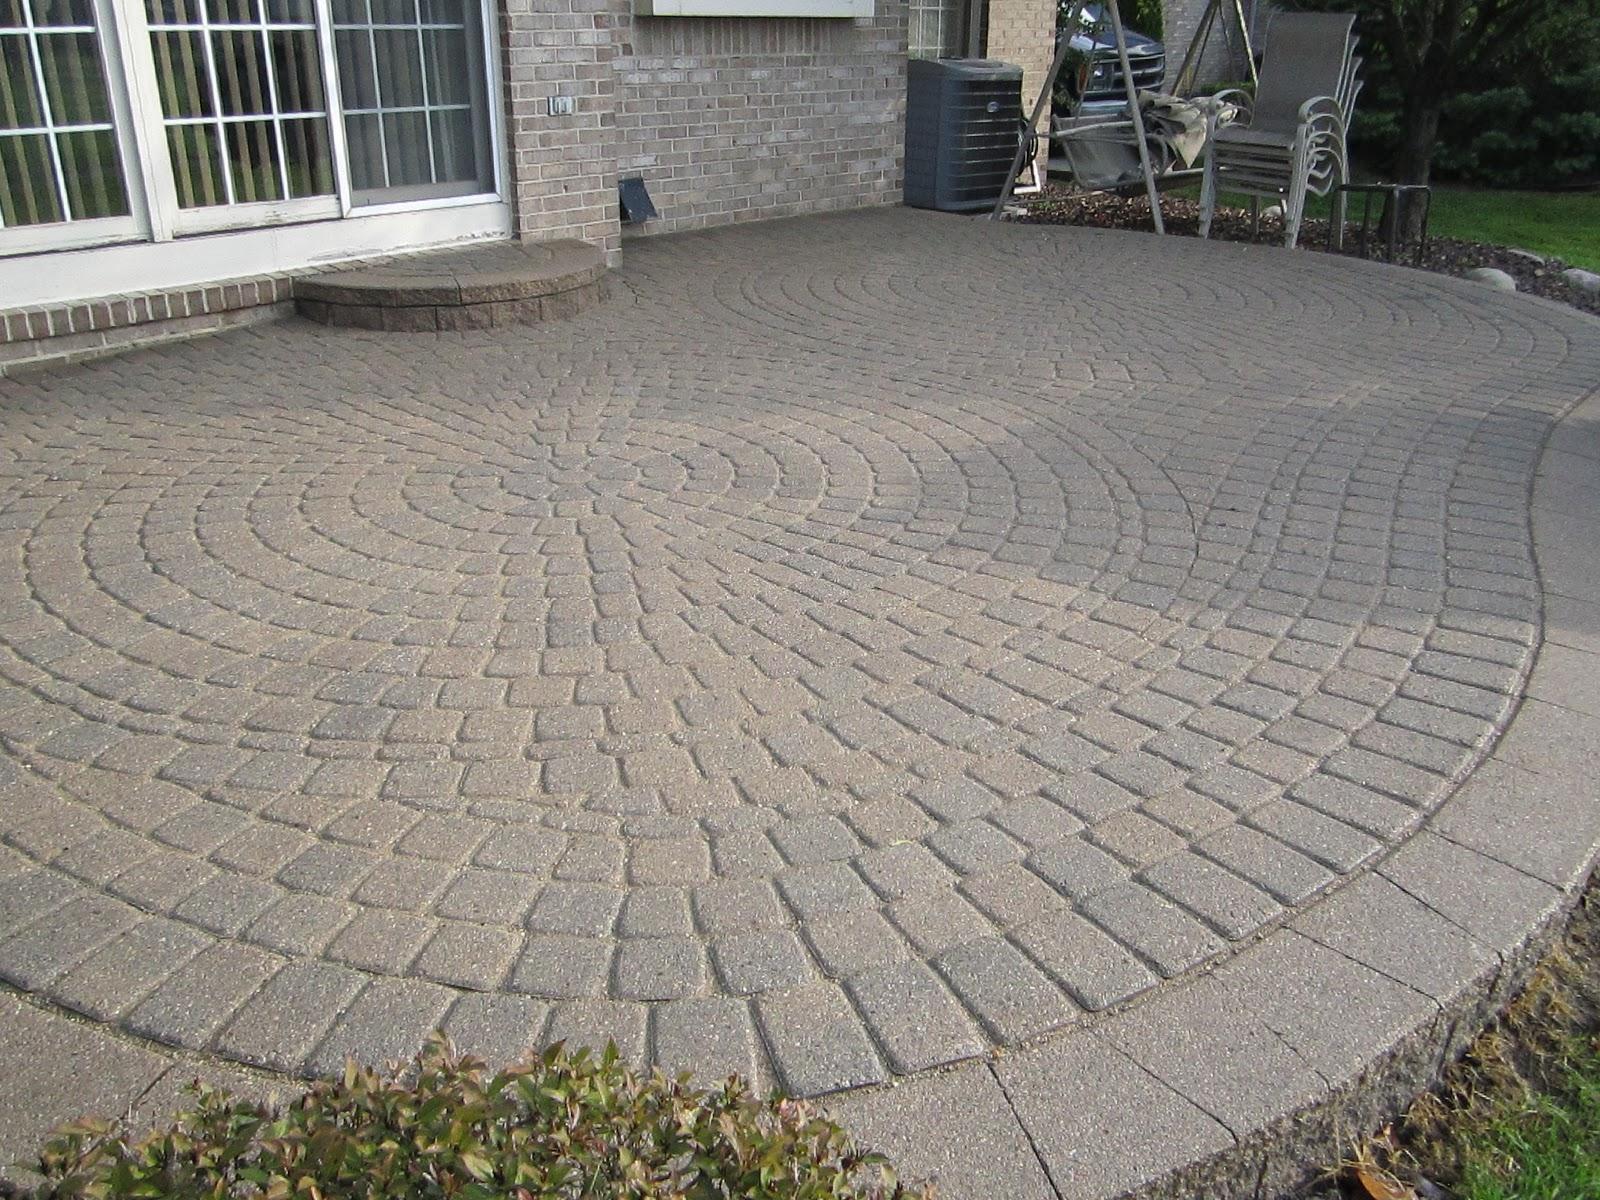 100 Estimate Paver Patio Cost Of Brick Crafts